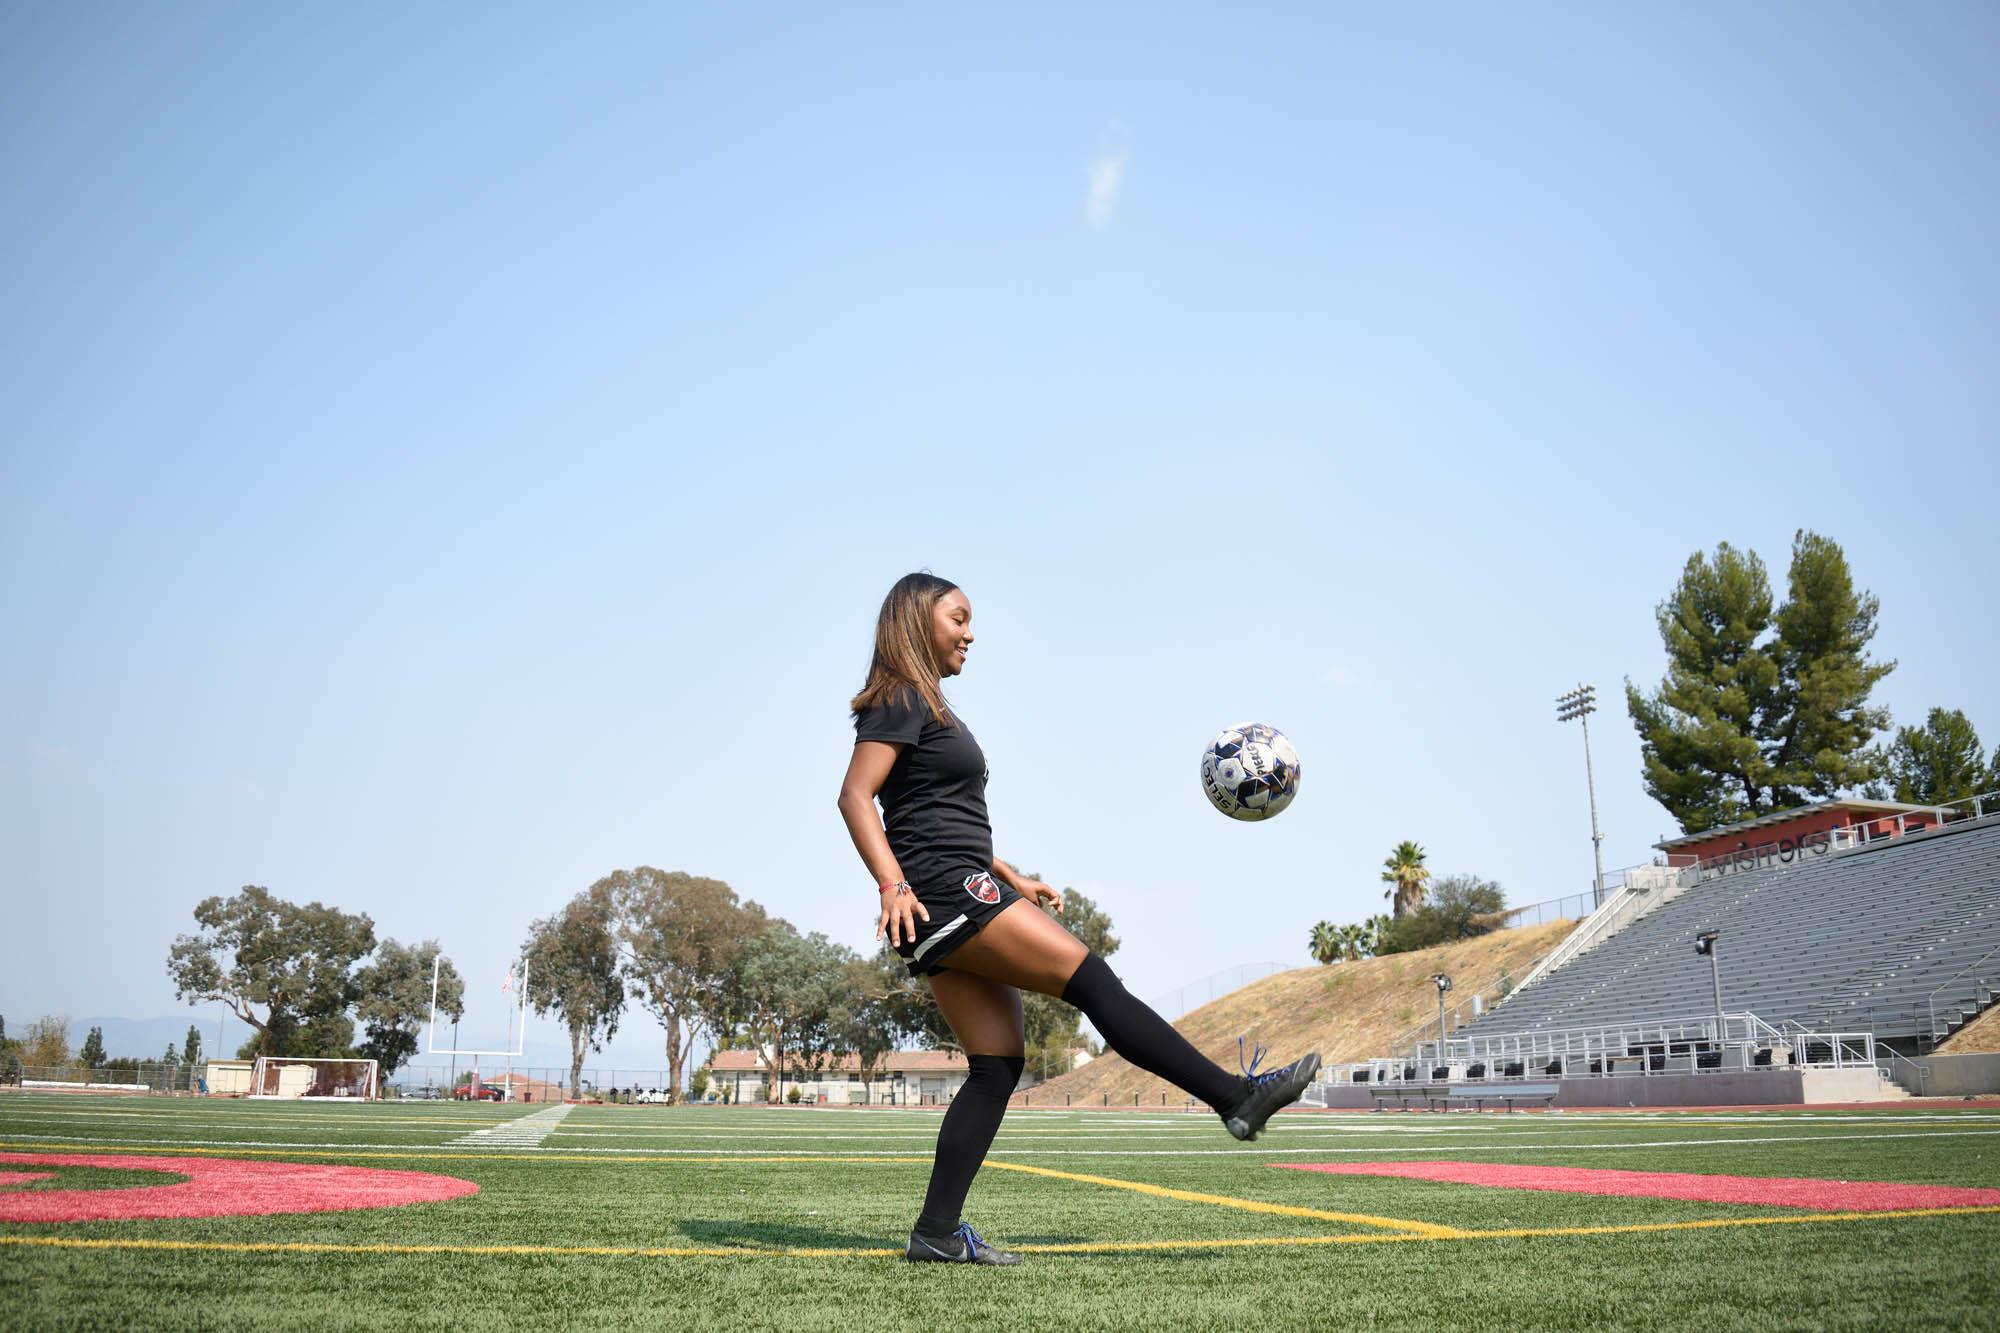 Eat, sleep, soccer, repeat